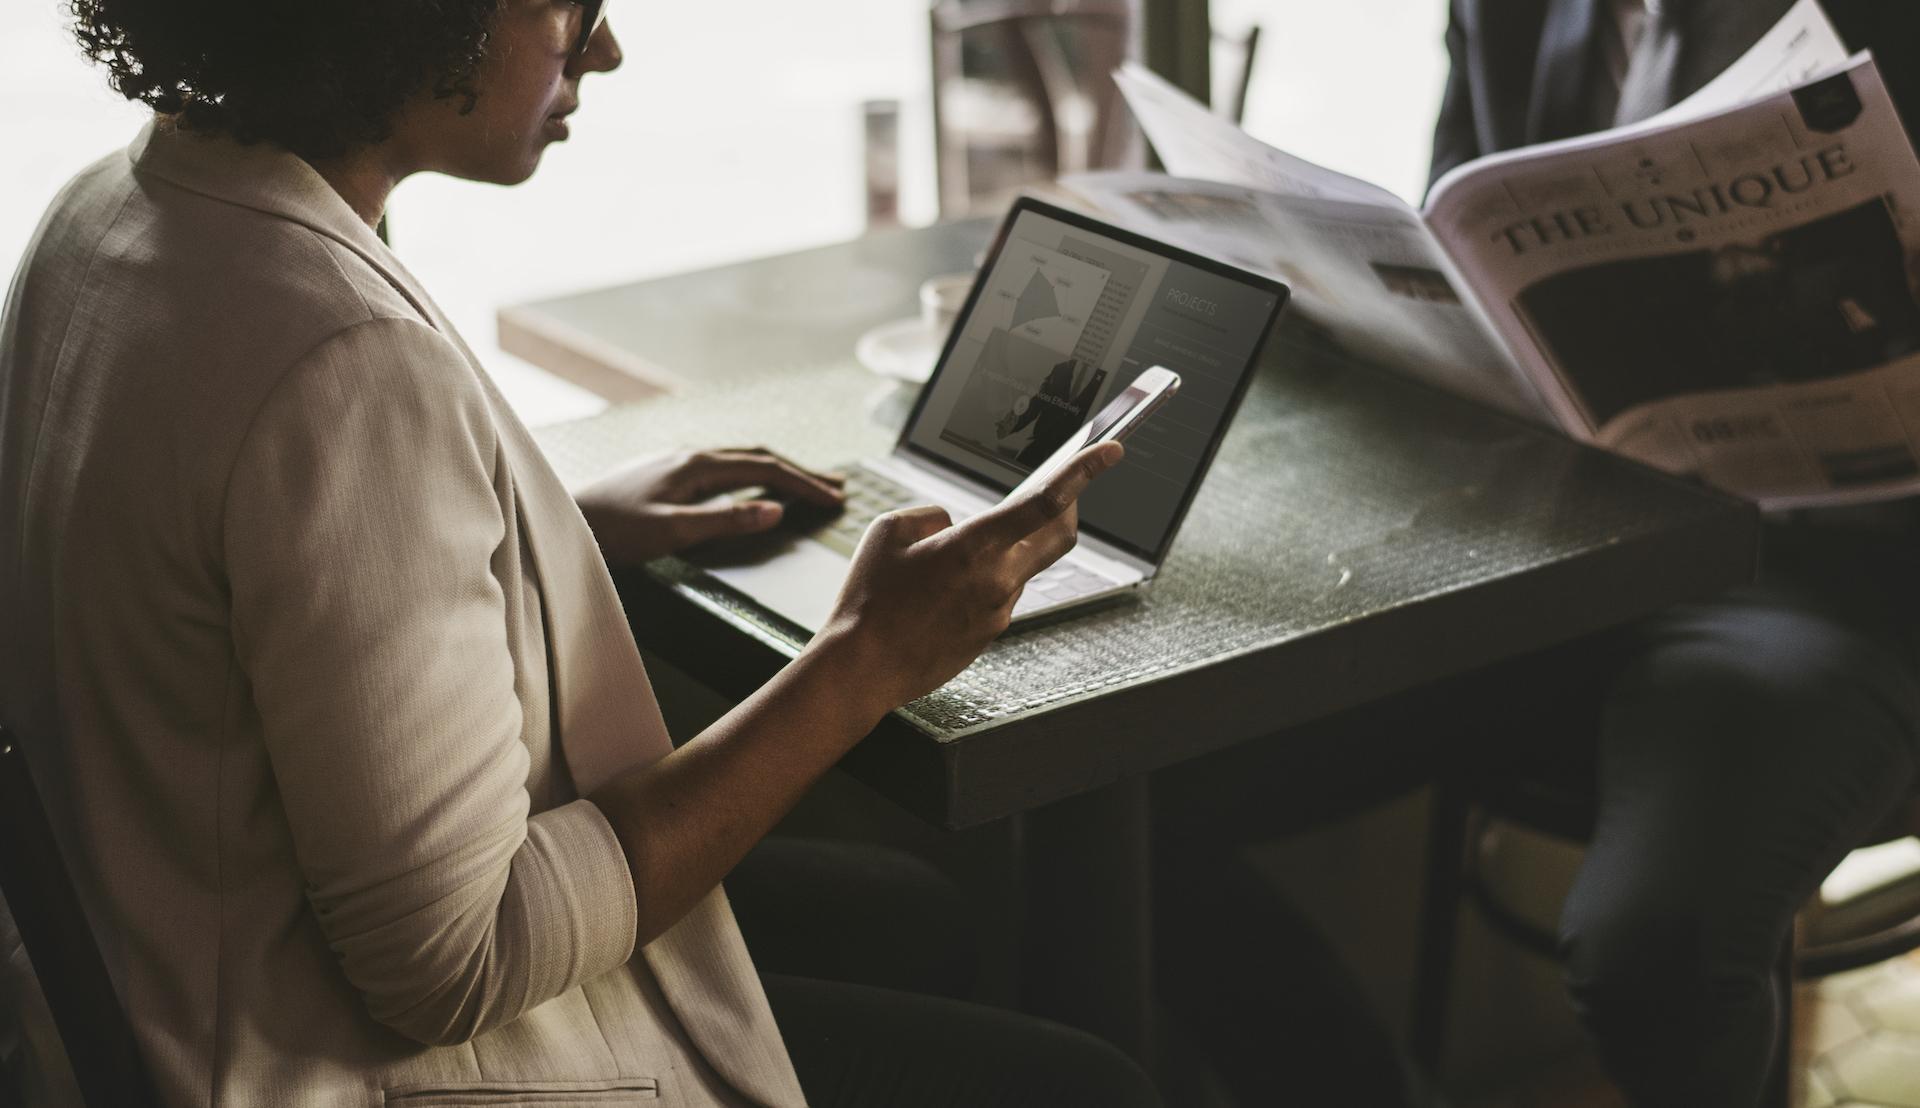 Introducing Tipser's New Analytics Dashboard for Merchants